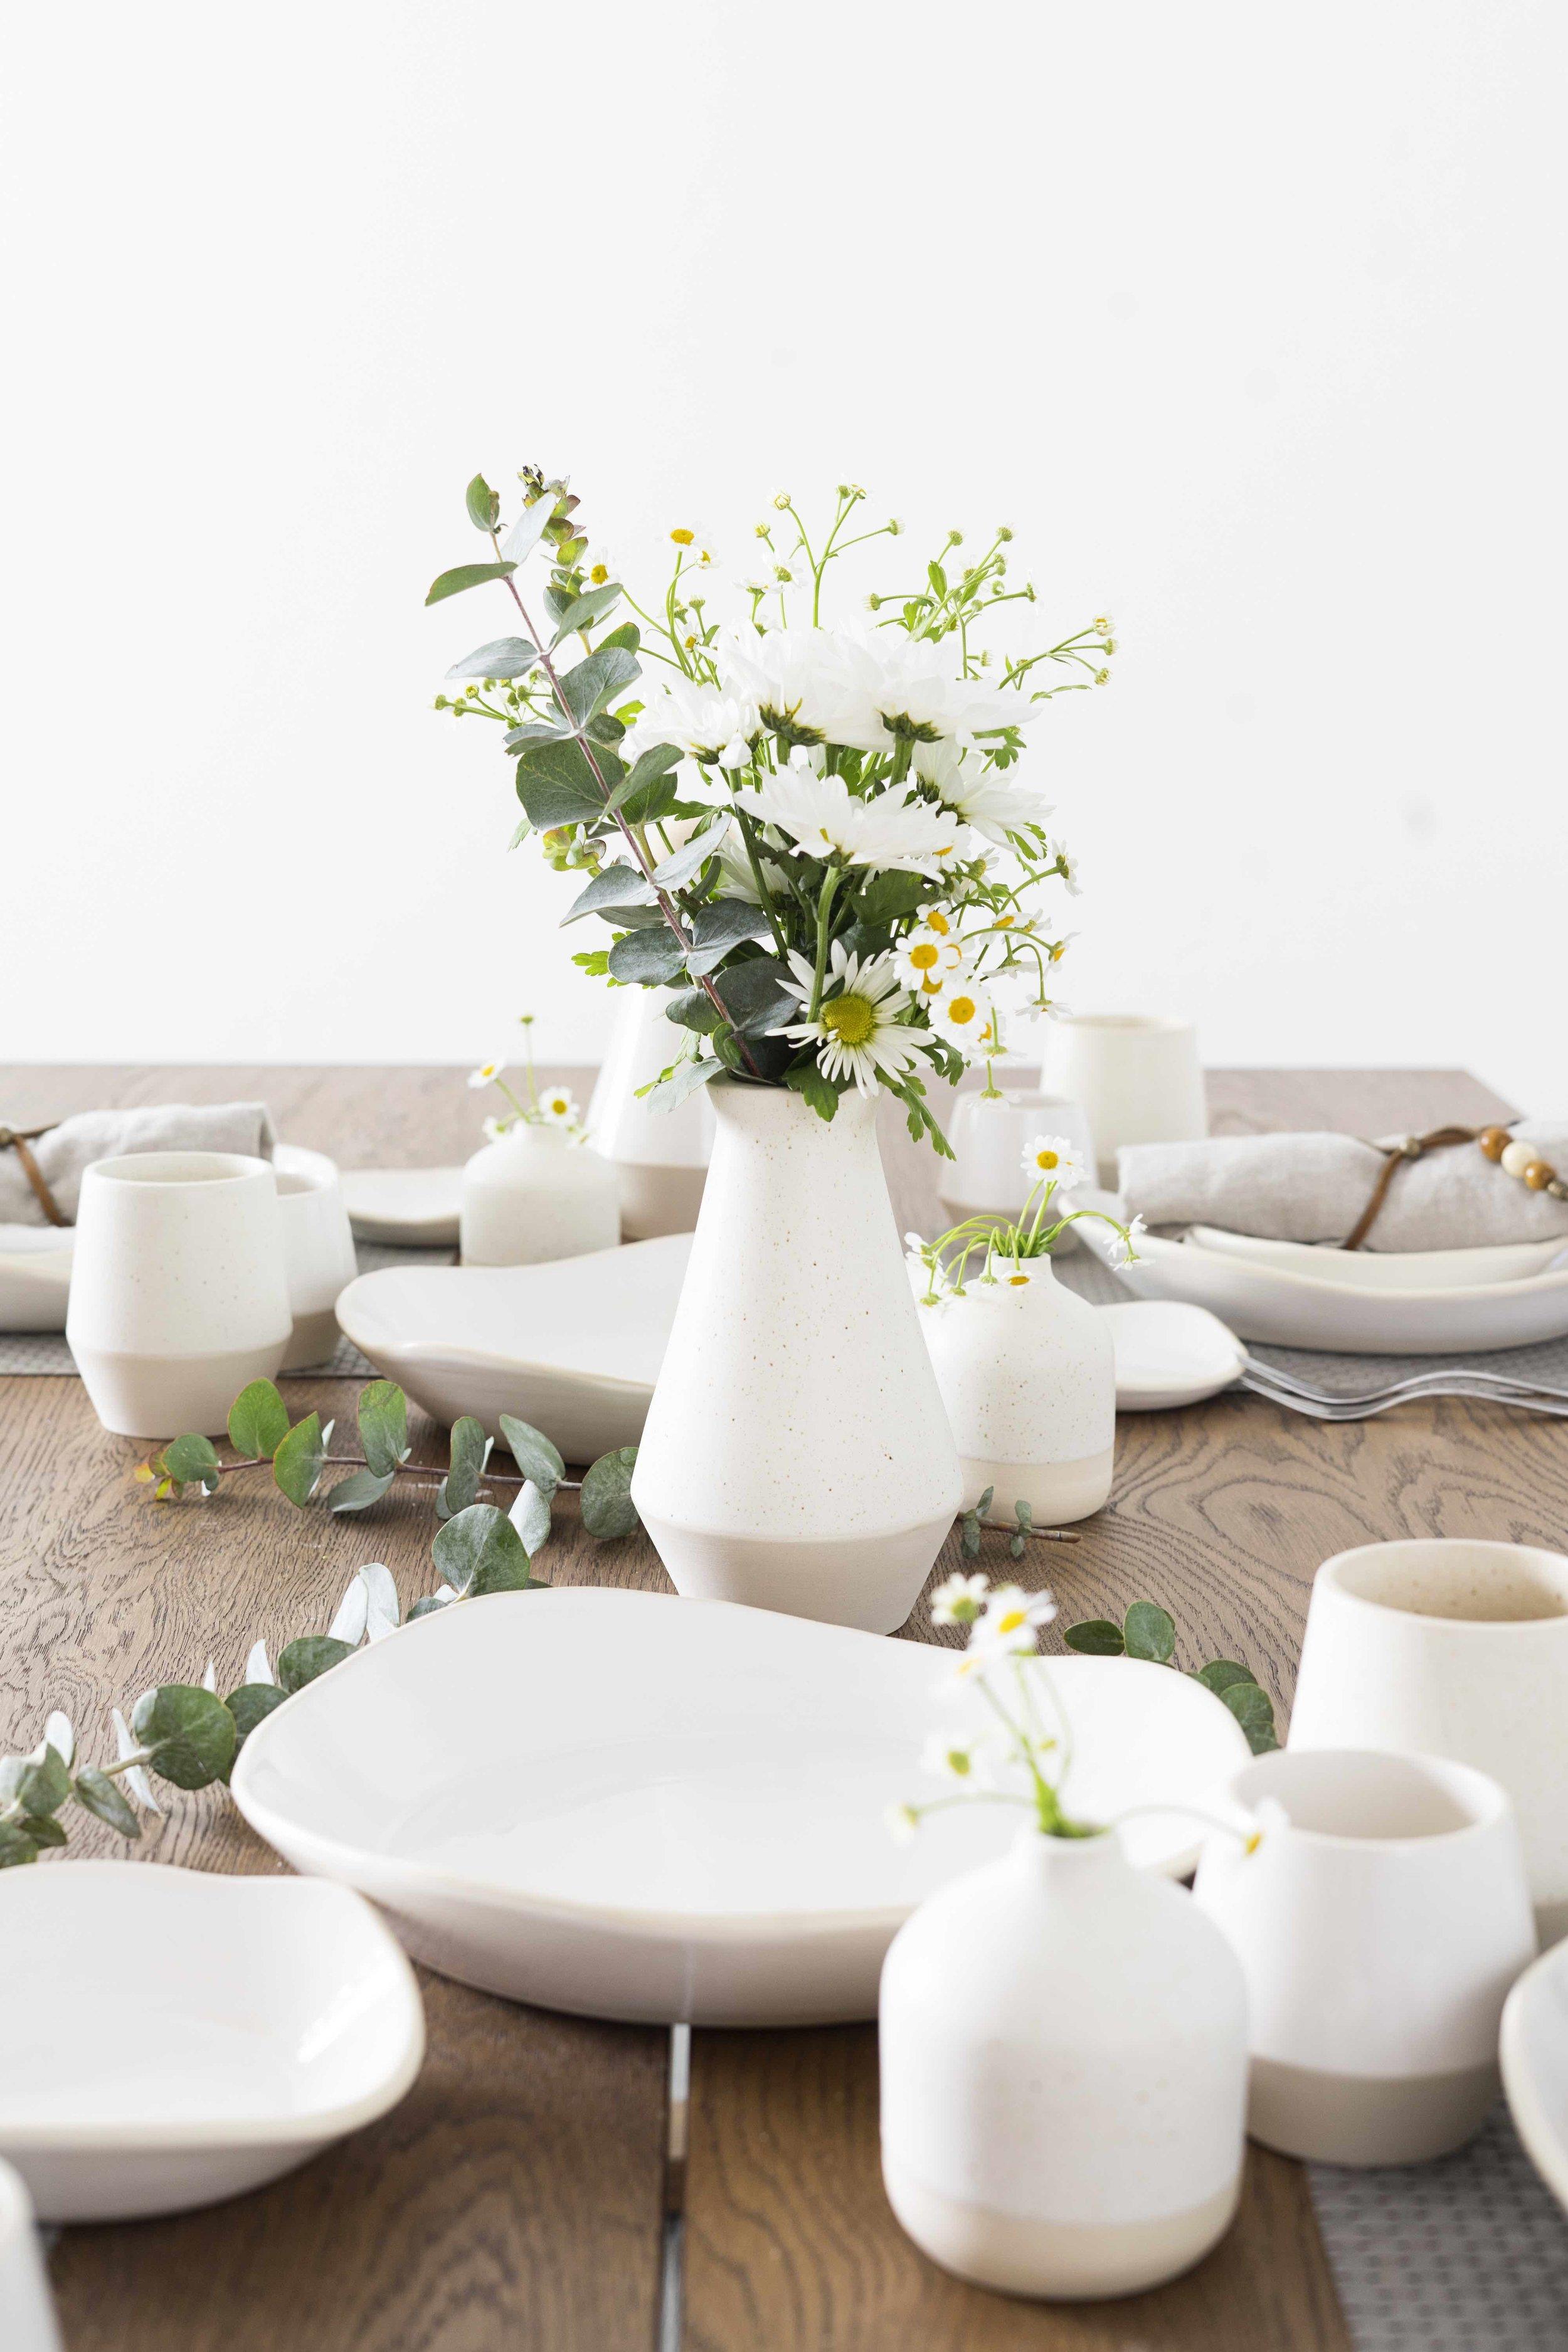 Pottery and Ceramics by Nicole Novena.jpg